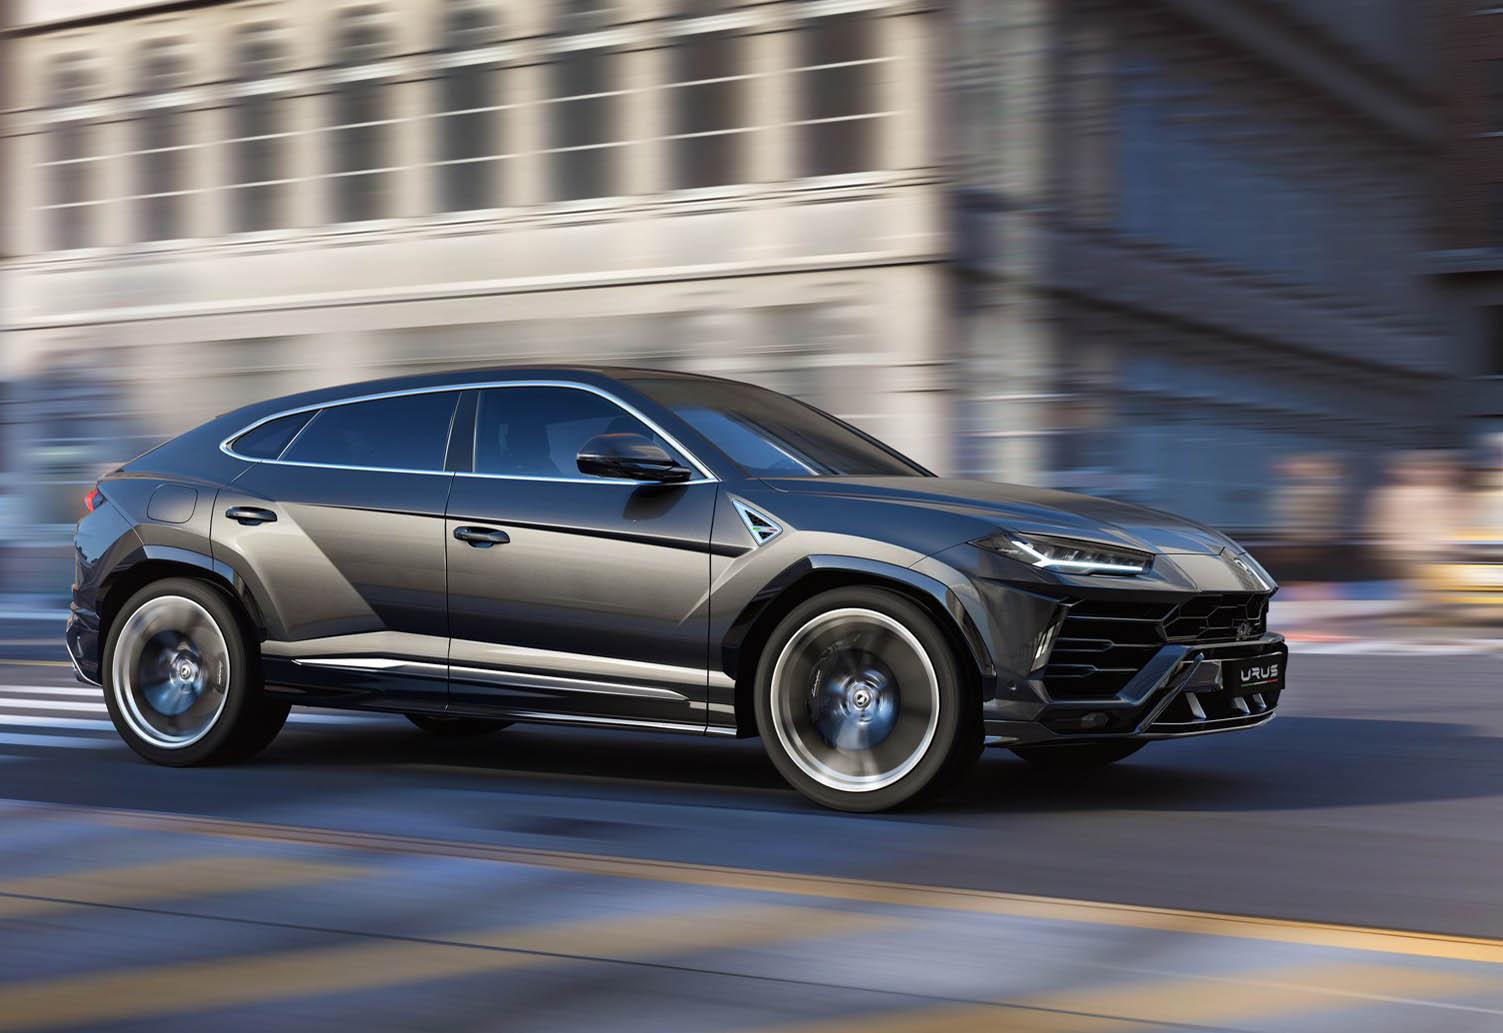 Супермощный кроссовер Lamborghini Urus 2018